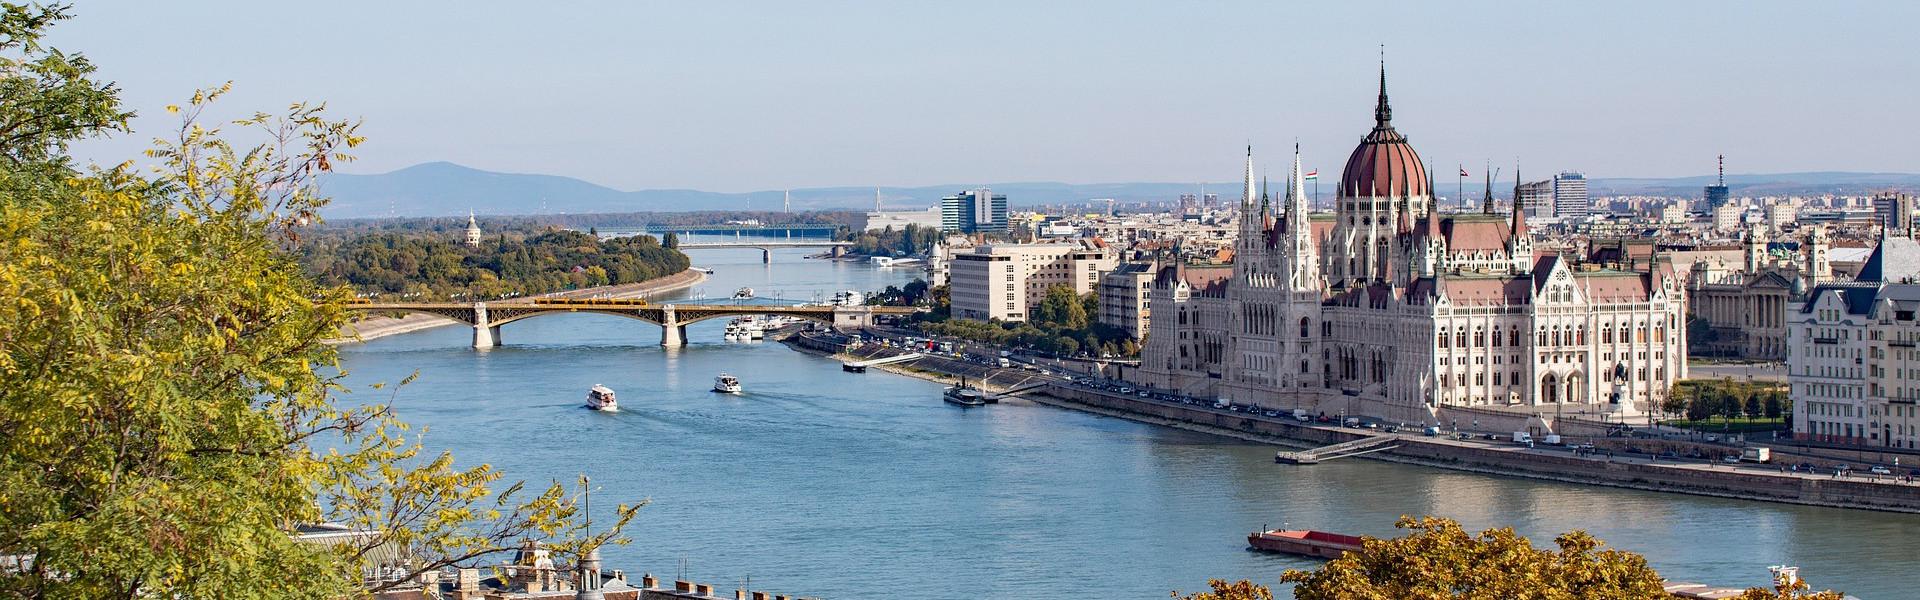 Destination image of Budapest